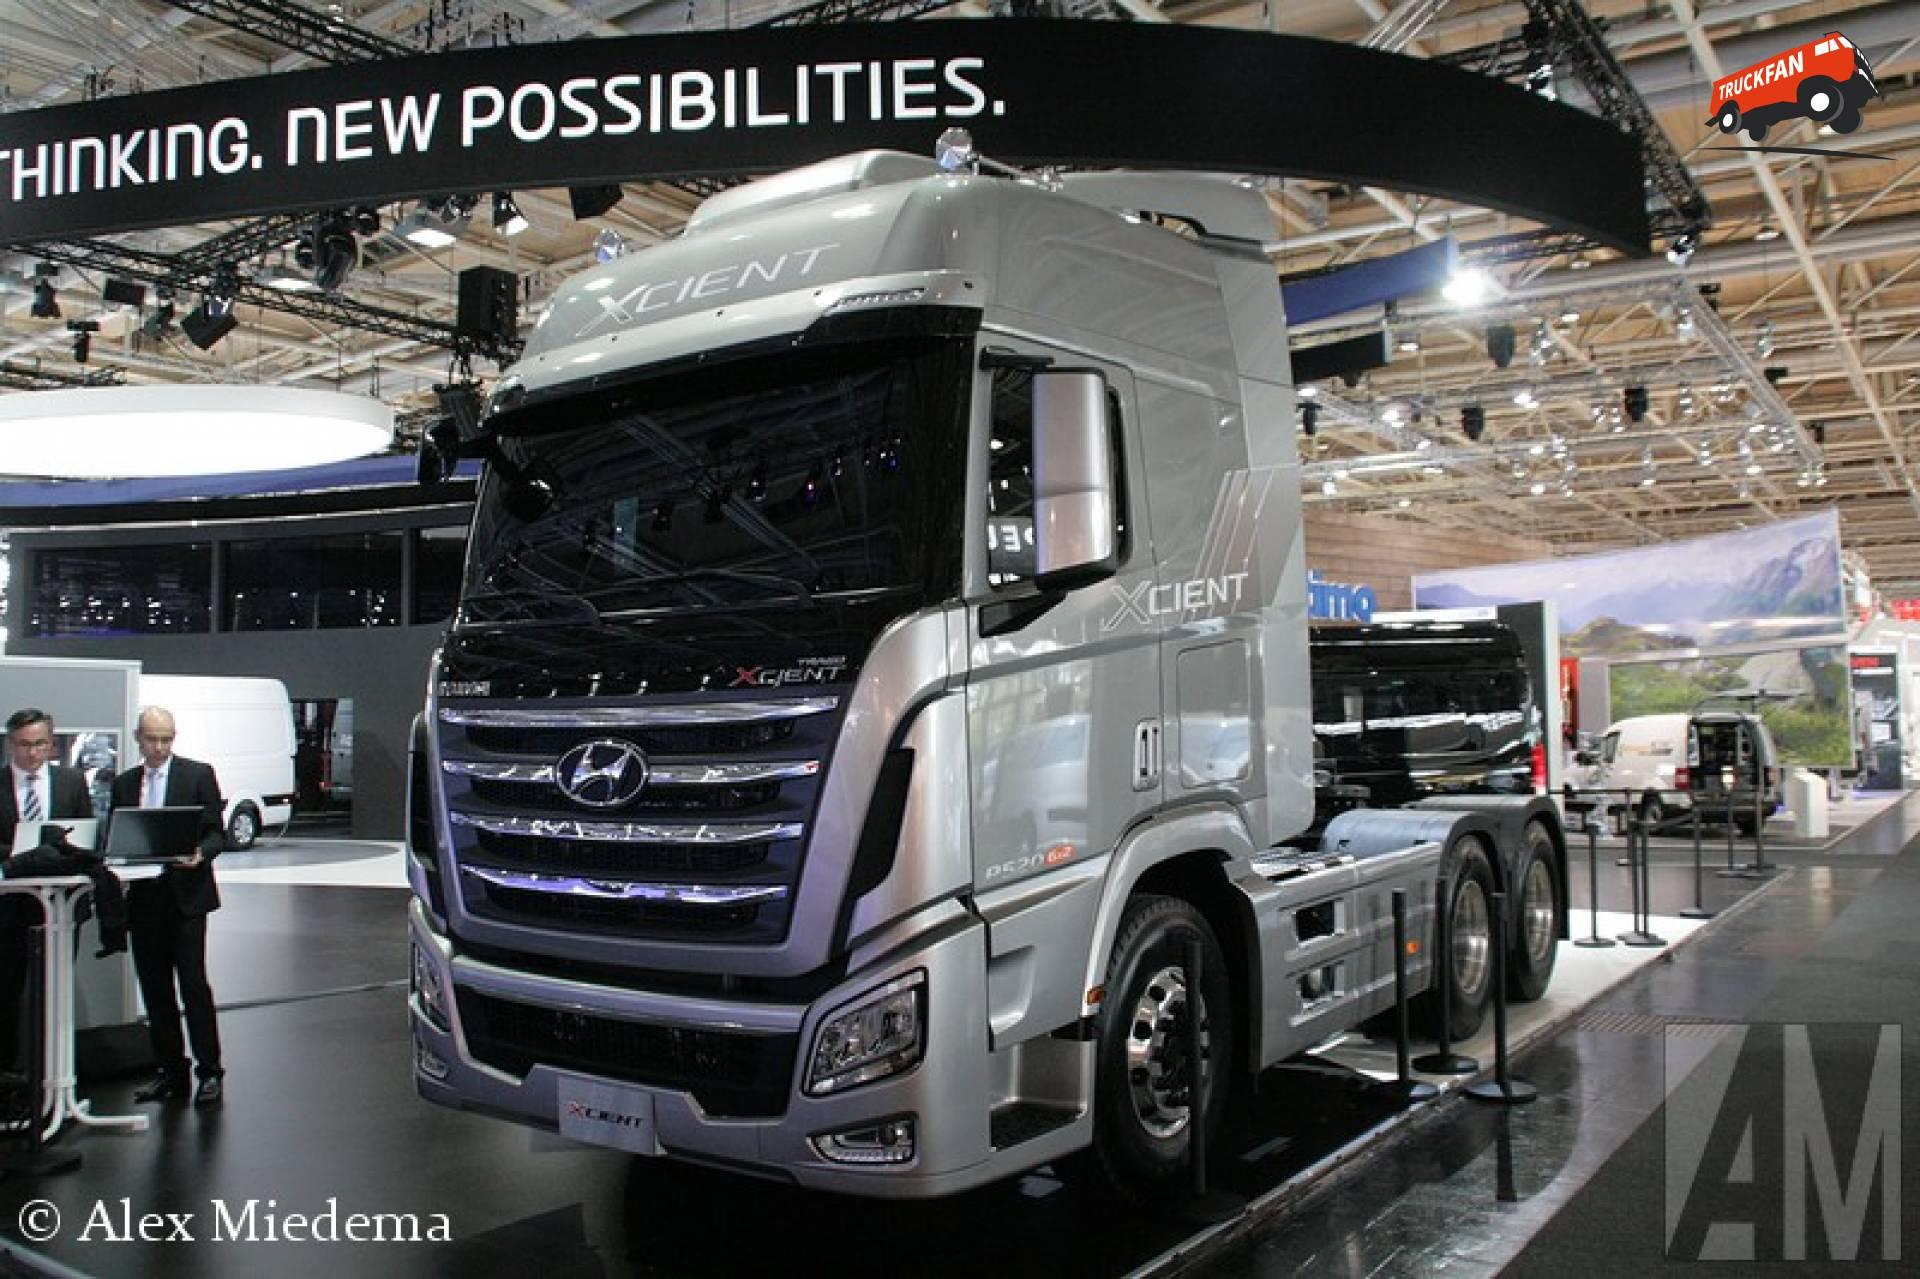 Hyundai Xcient